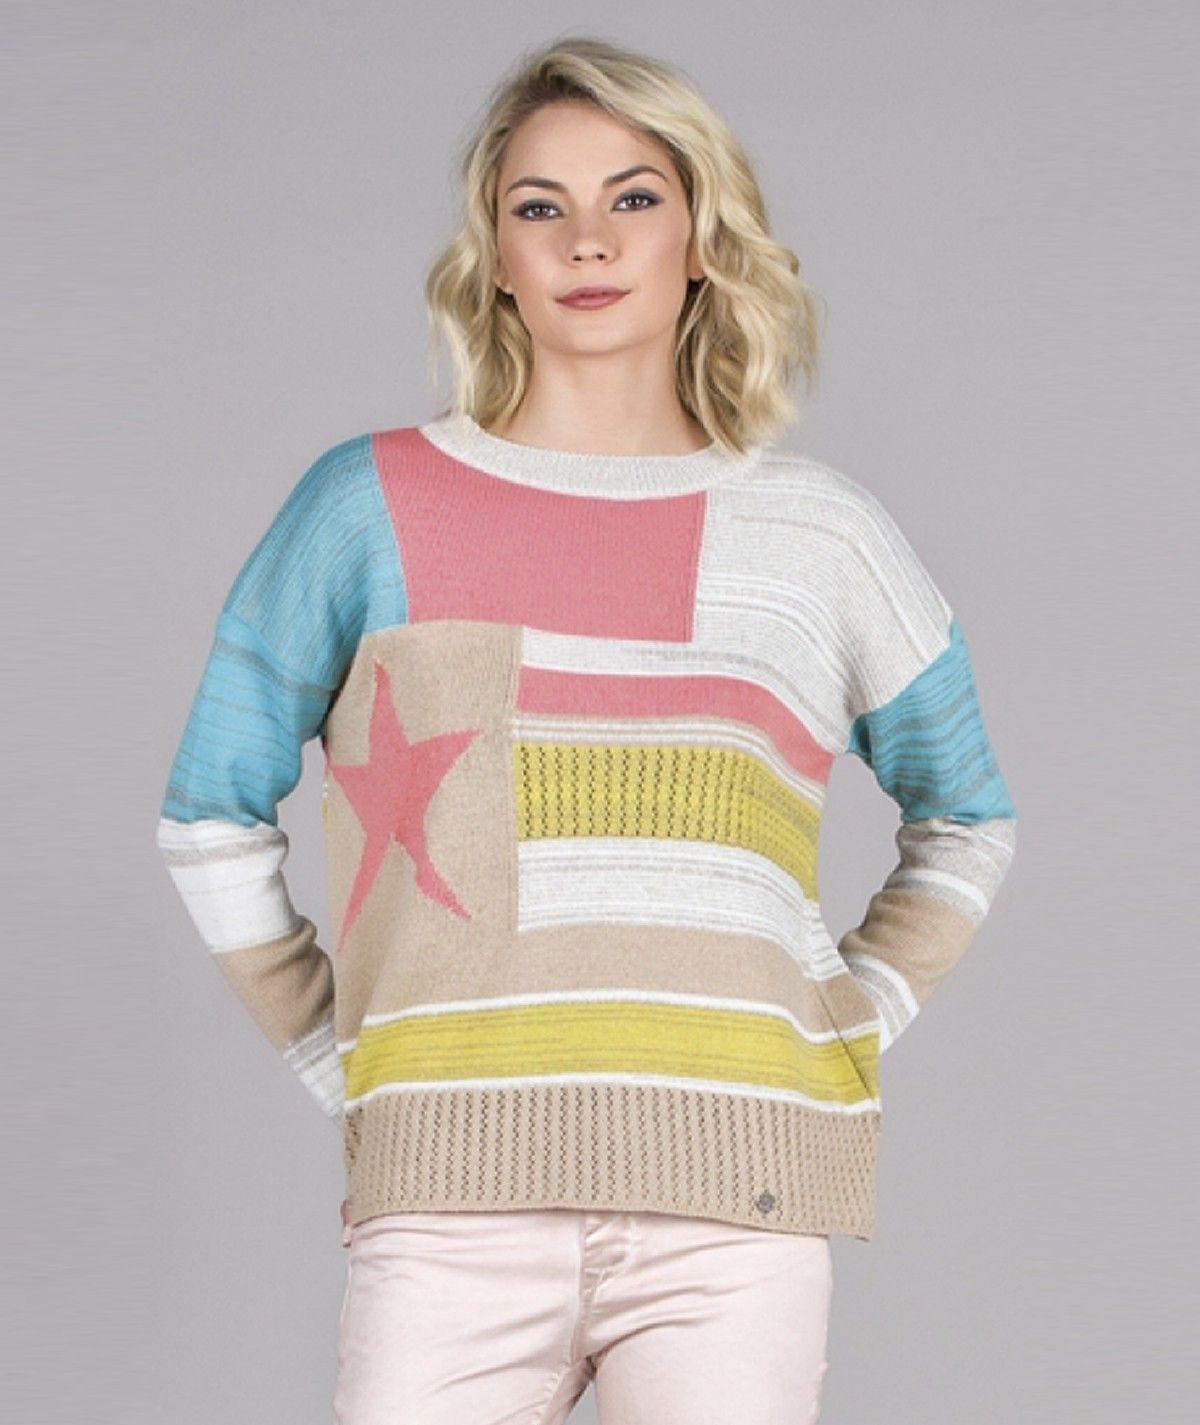 Camisola  patchwork